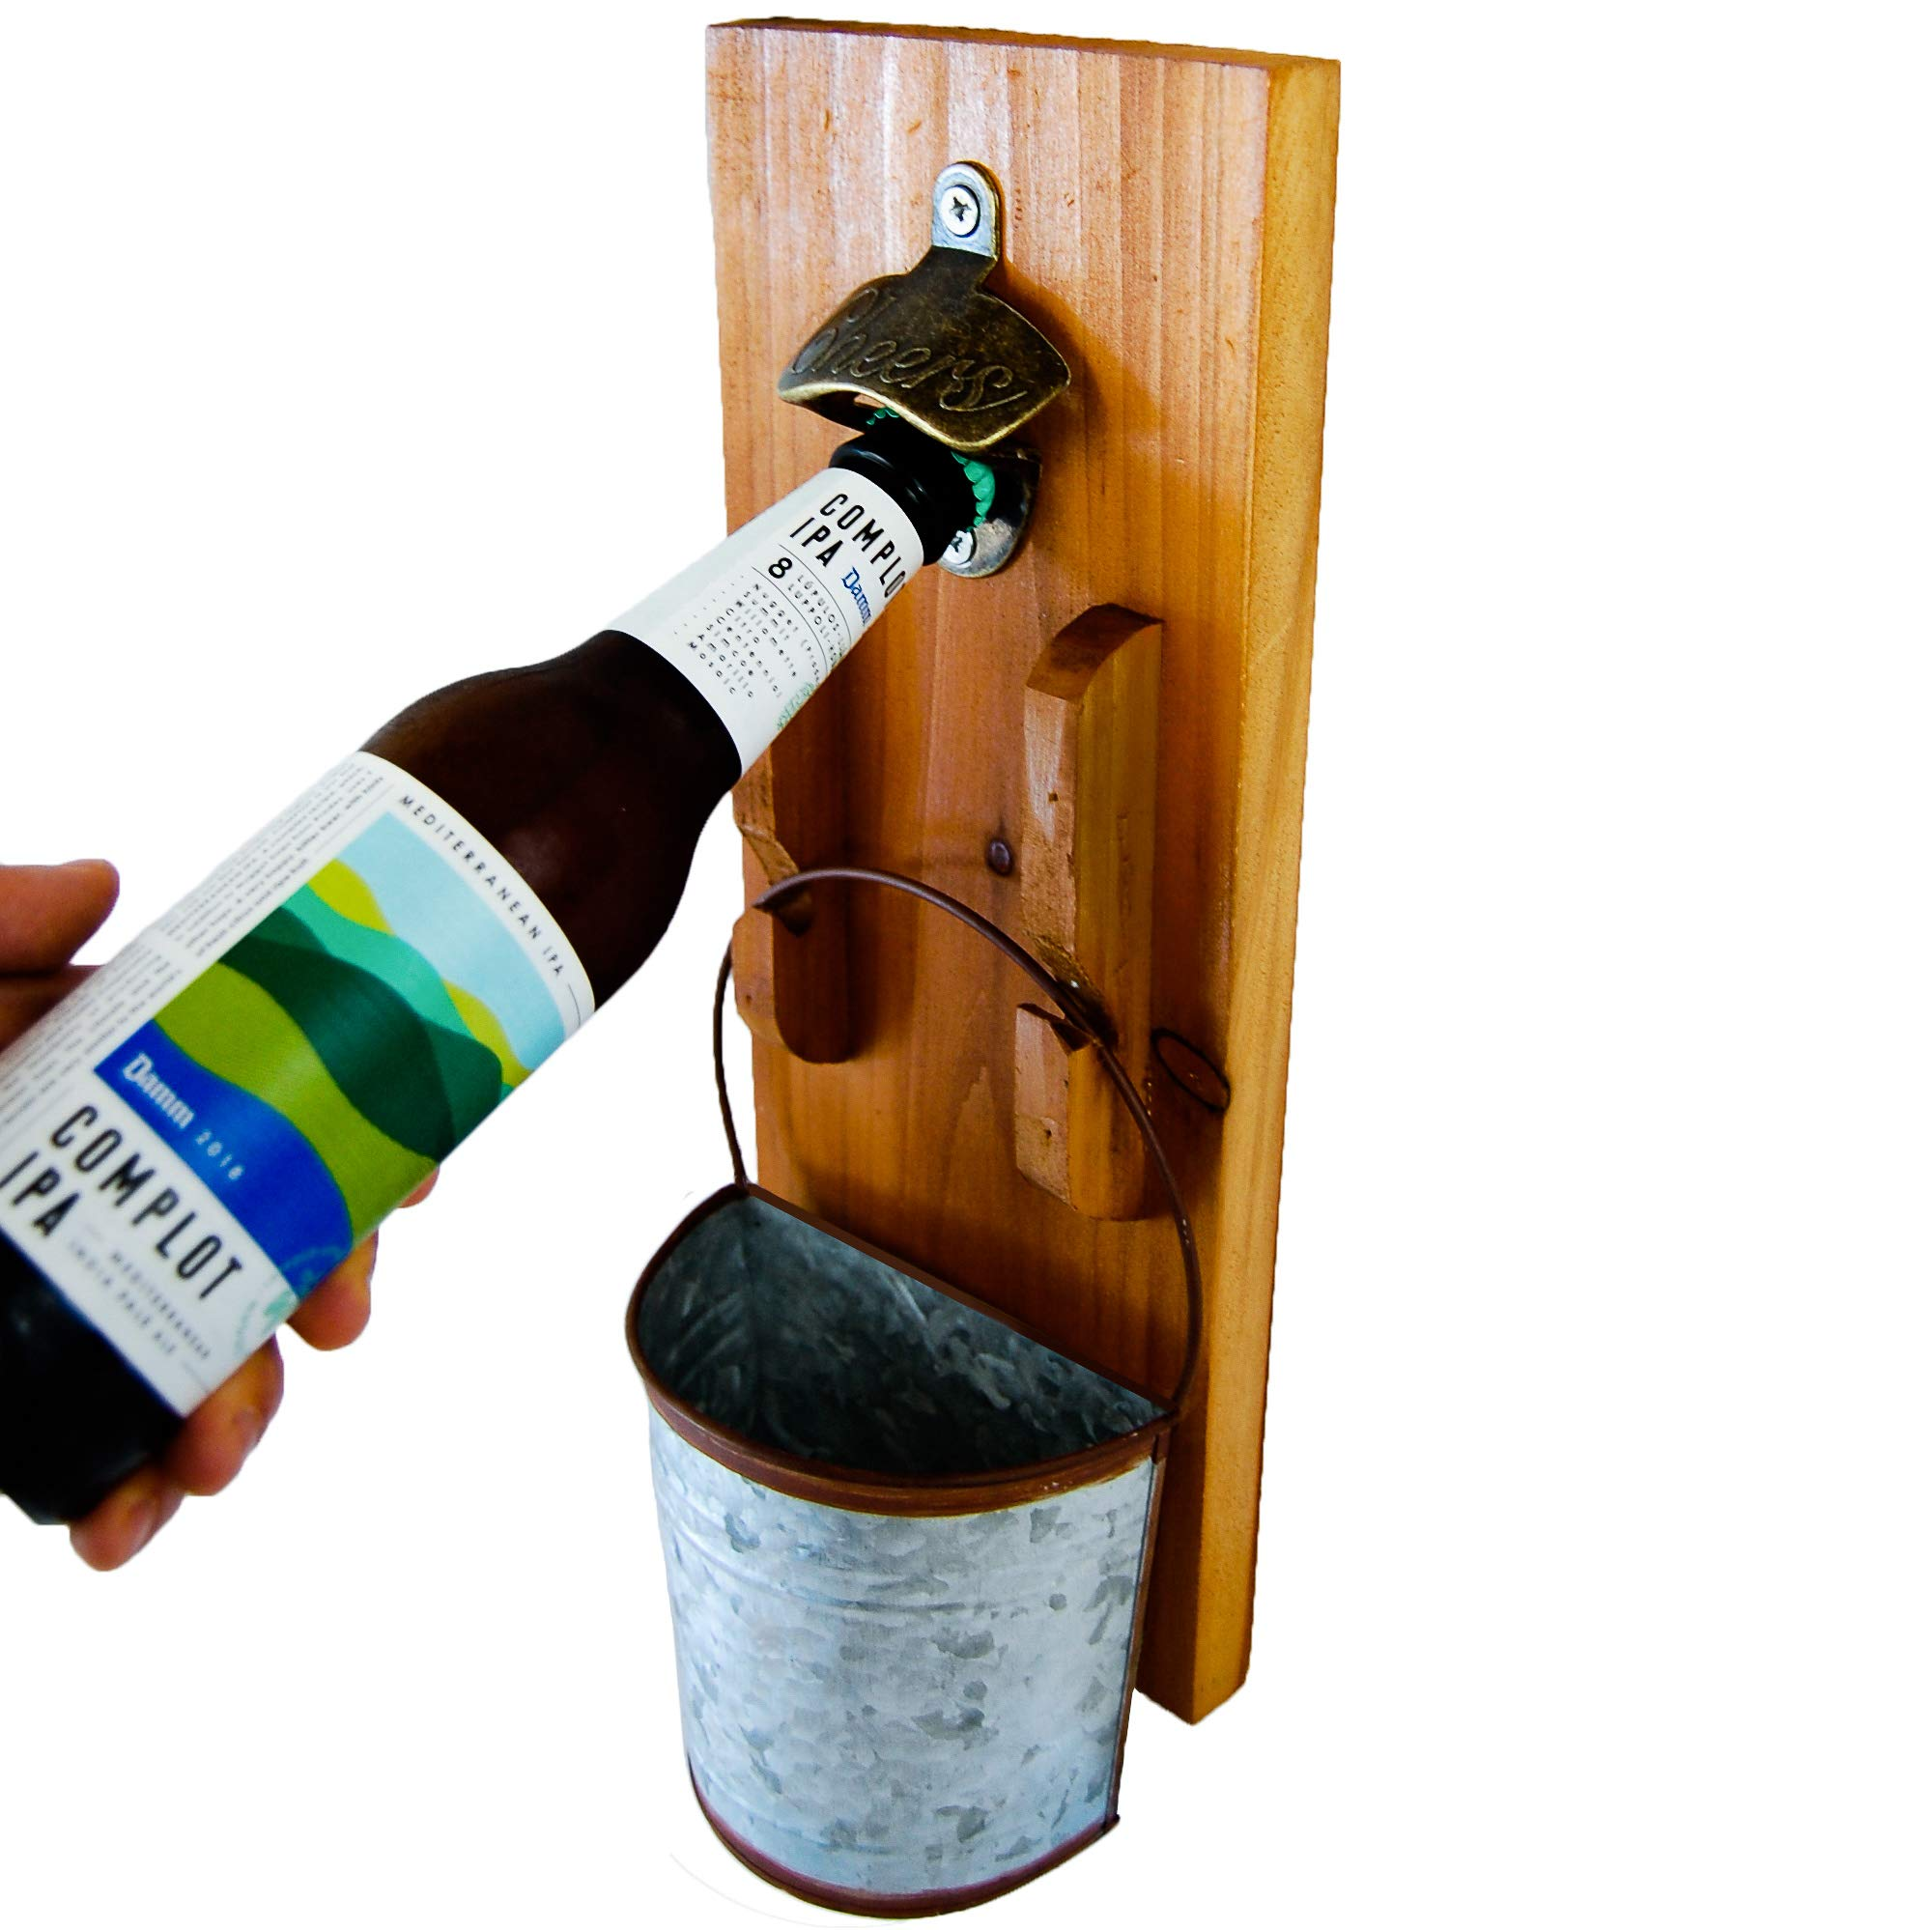 Bottle Opener Wall Mounted - Rustic Vintage Wood Plaque Beer Opener